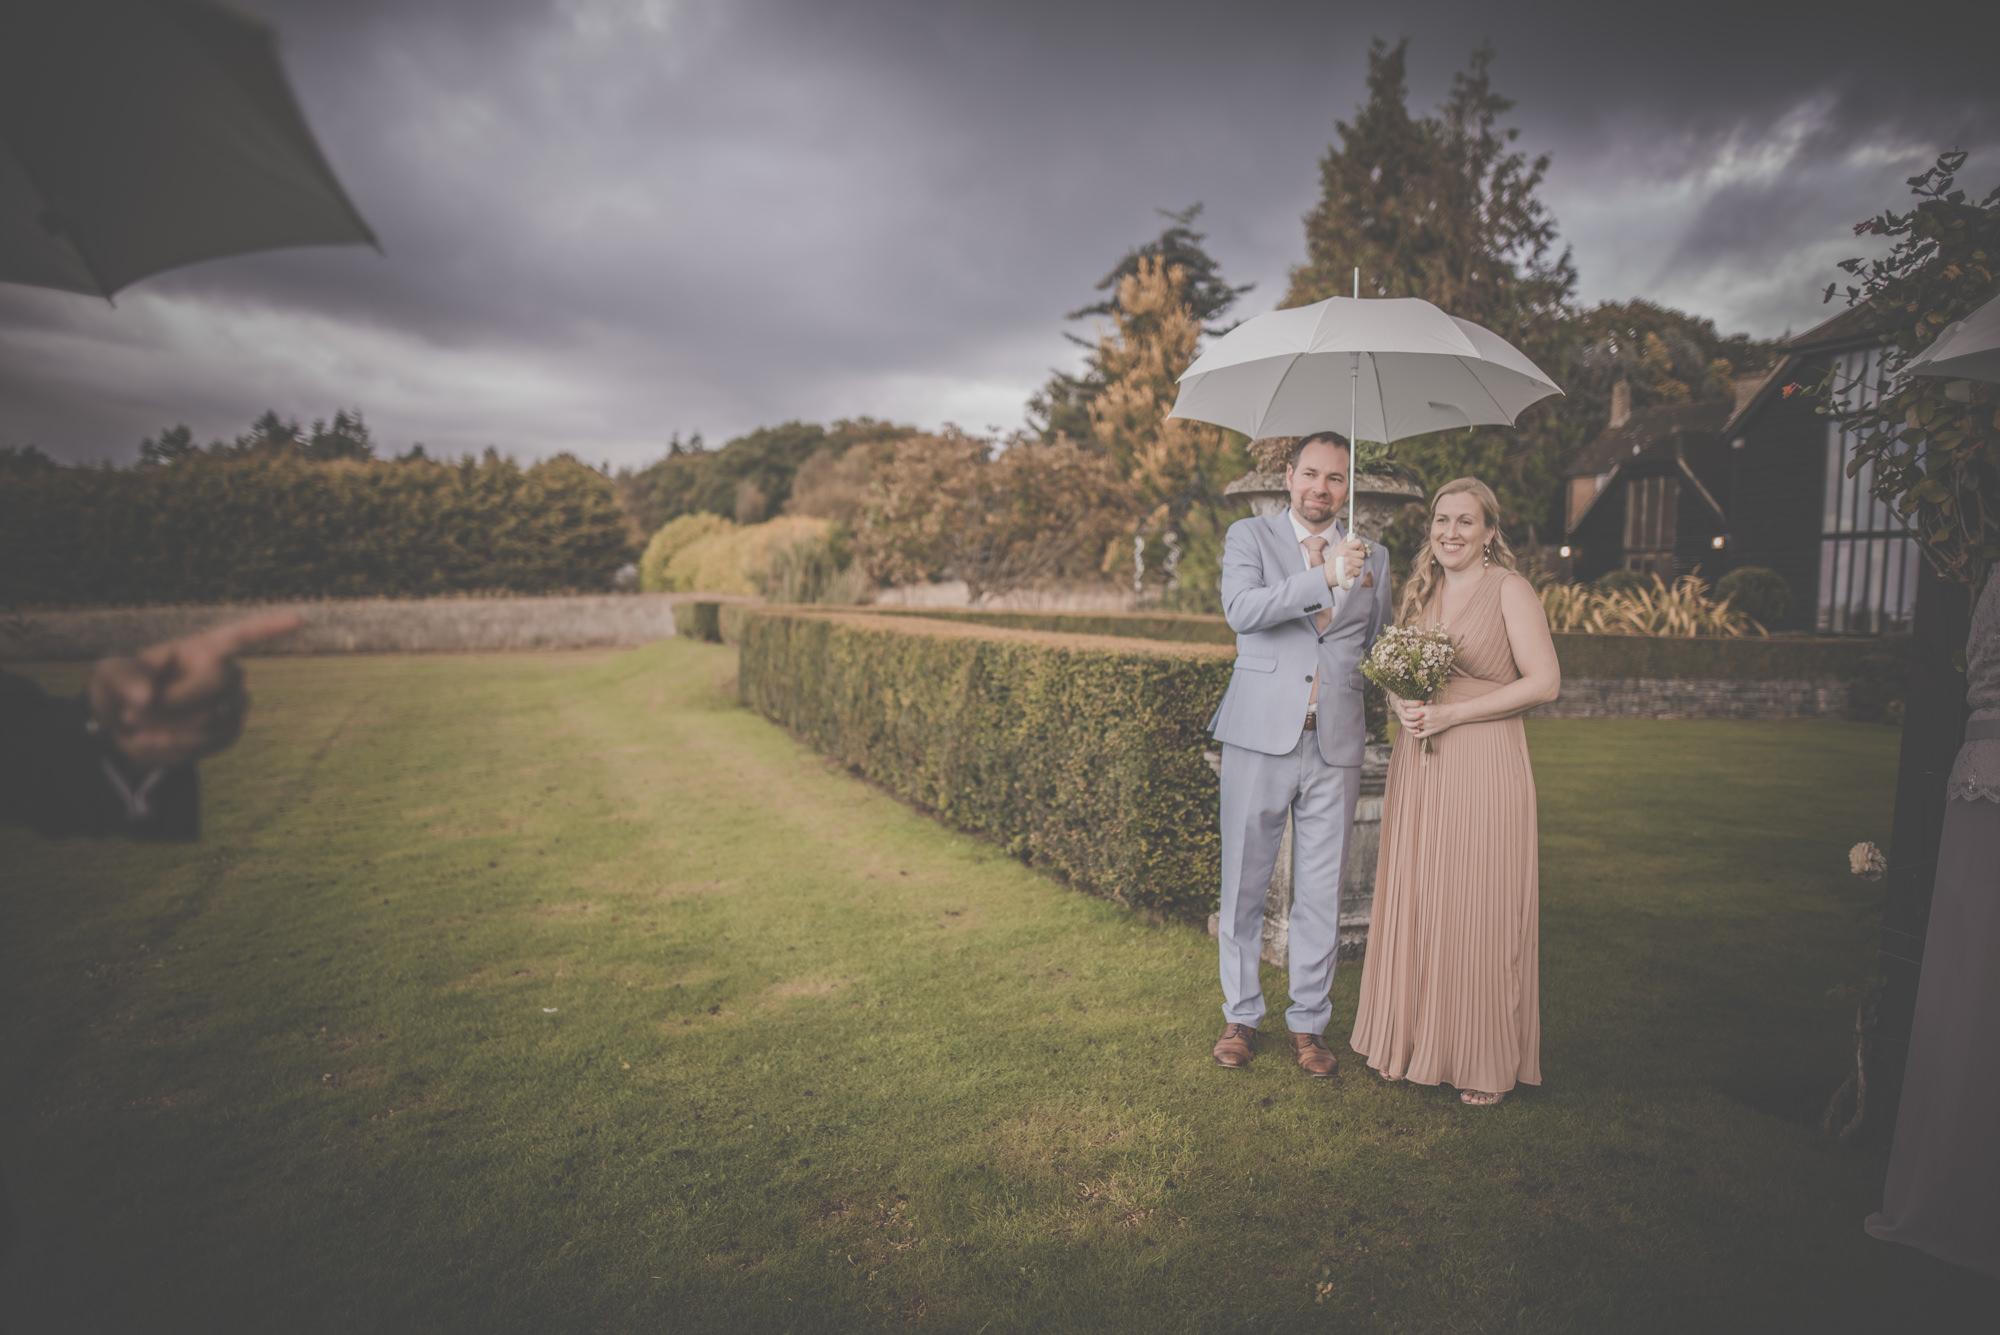 Charisse-and-James-wedding-in-Cain-Manor-Venue-Hampshire-Manu-Mendoza-Wedding-Photography-382.jpg